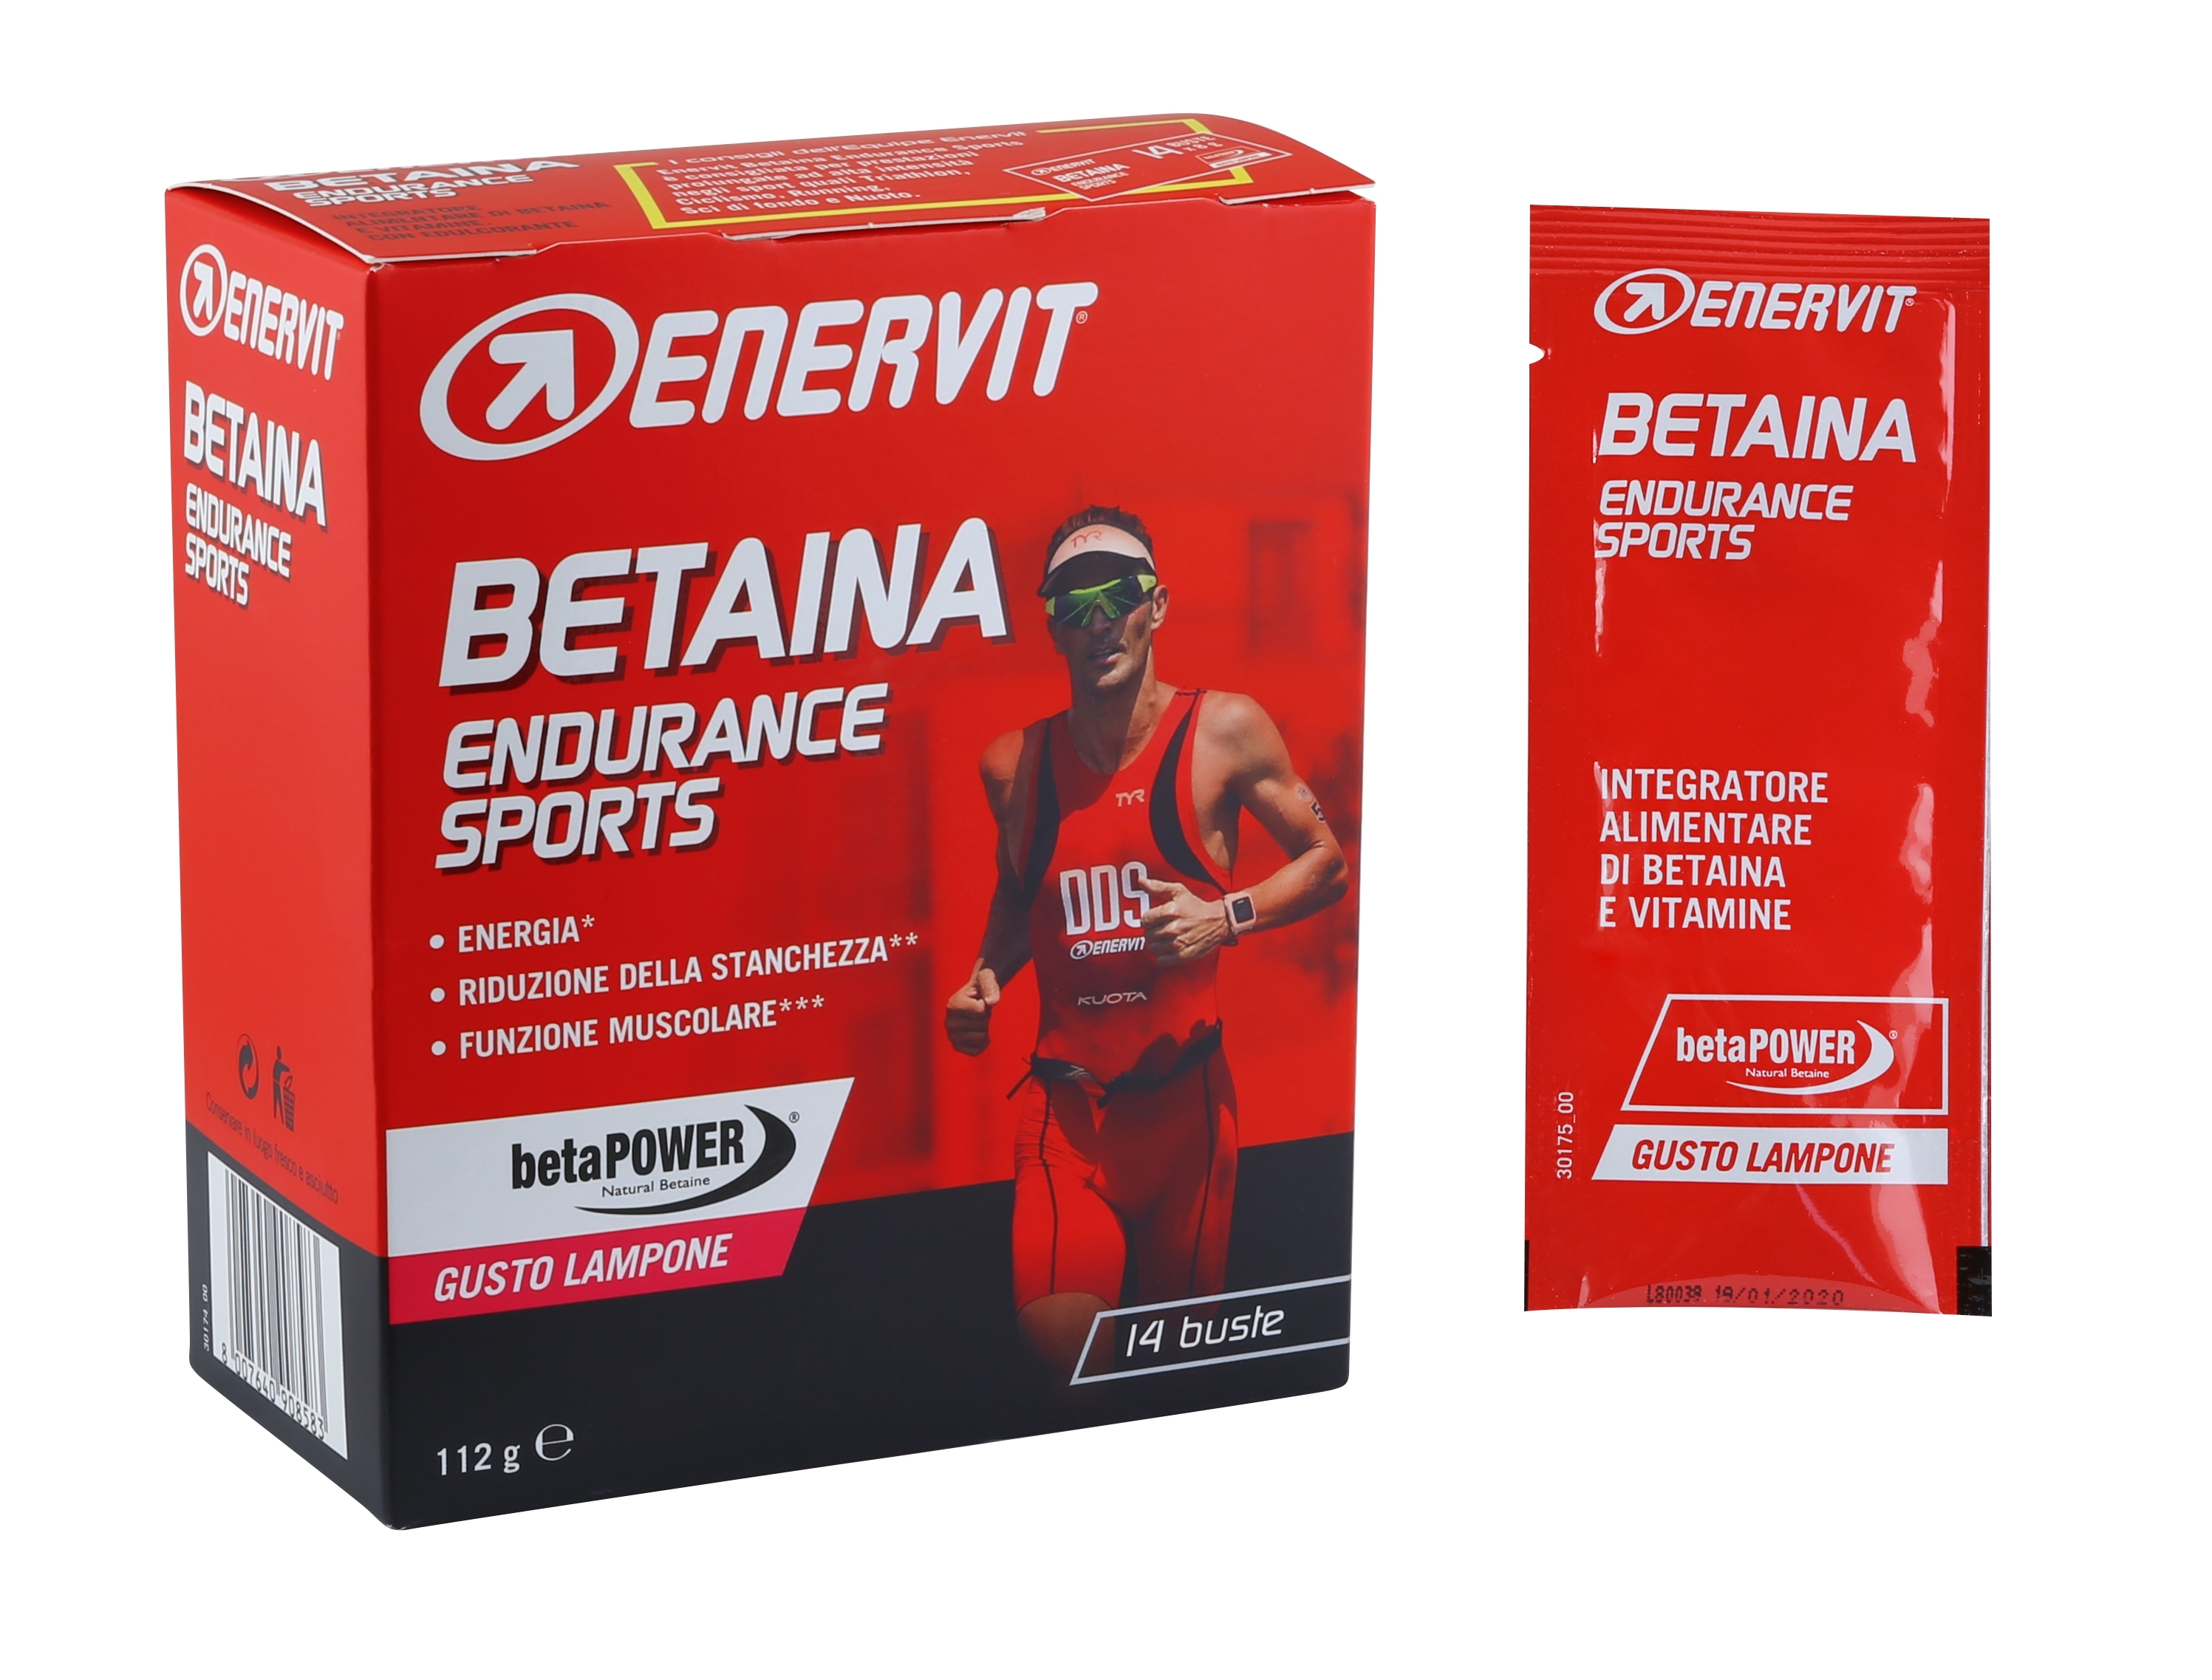 ENERVIT BETAINA Endurance Sports 14x 8g, malina